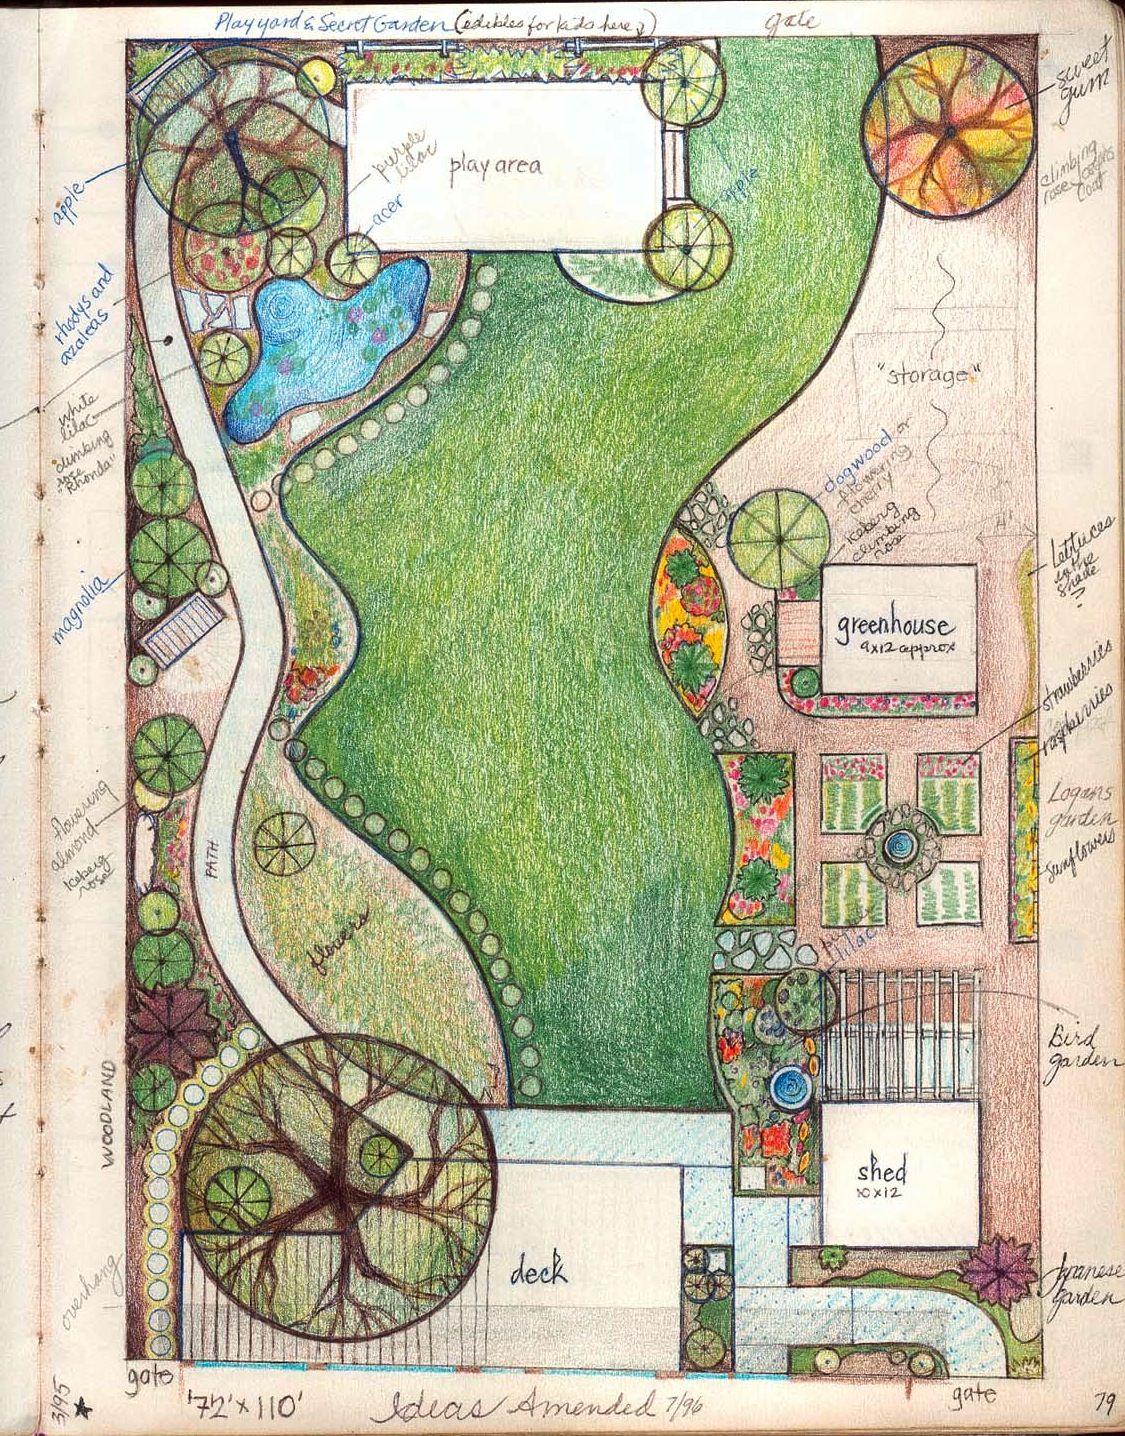 garden landscaping ideas via Simphome.com